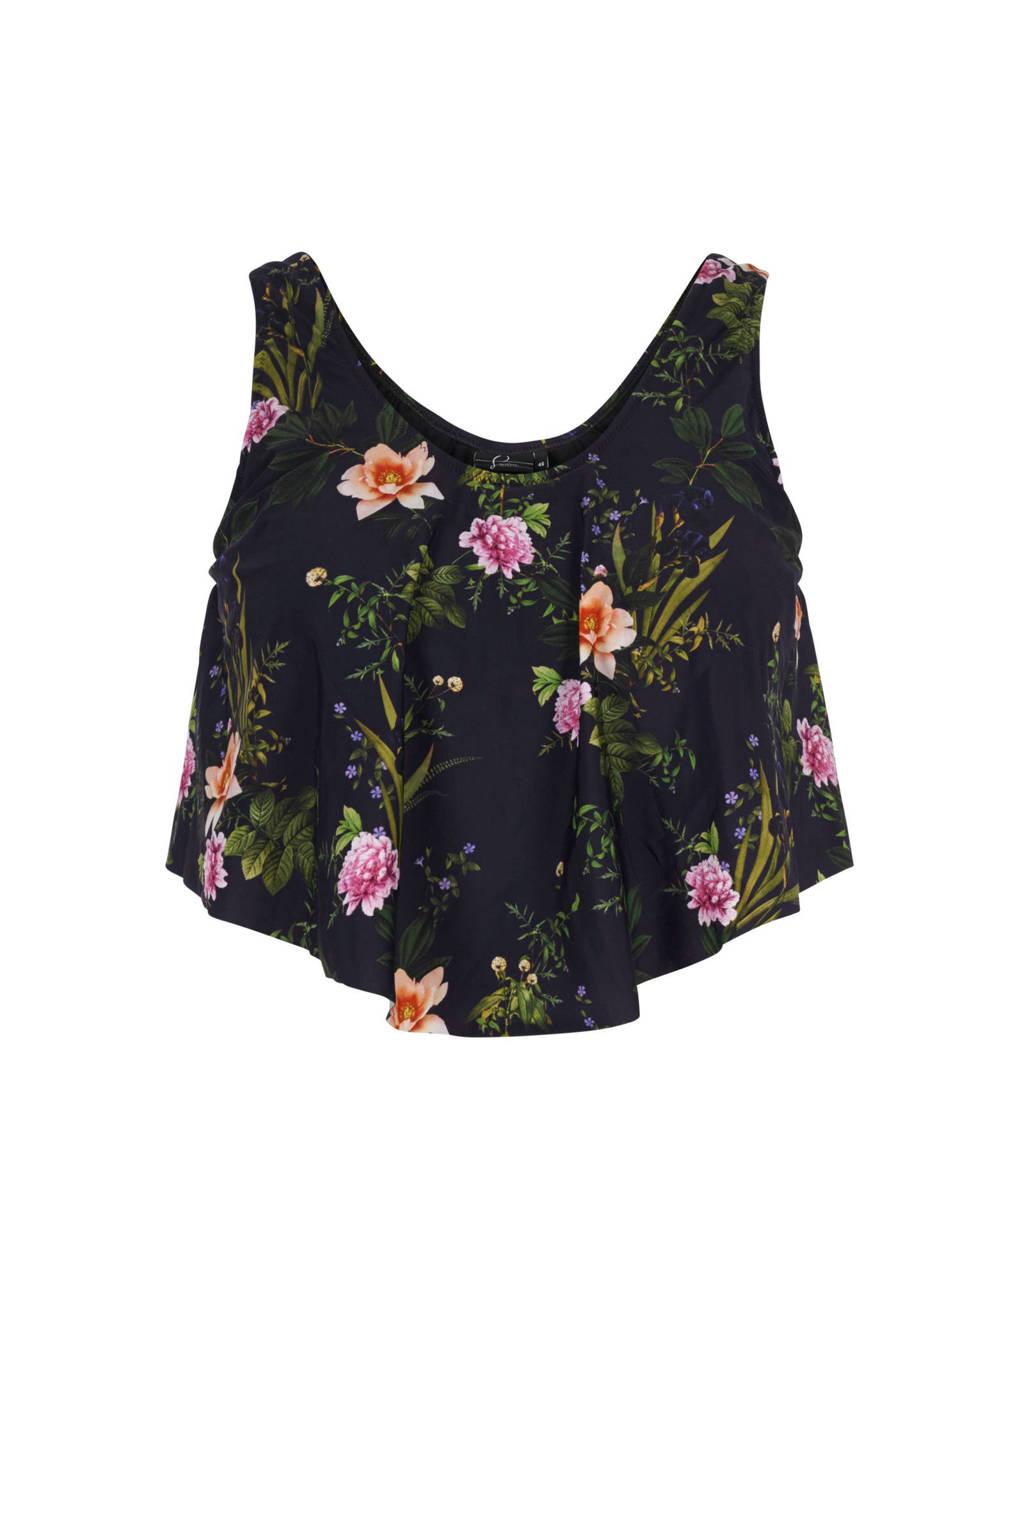 Zizzi corrigerende tankini bikinitop +size met all over print zwart, Zwart/groen/roze